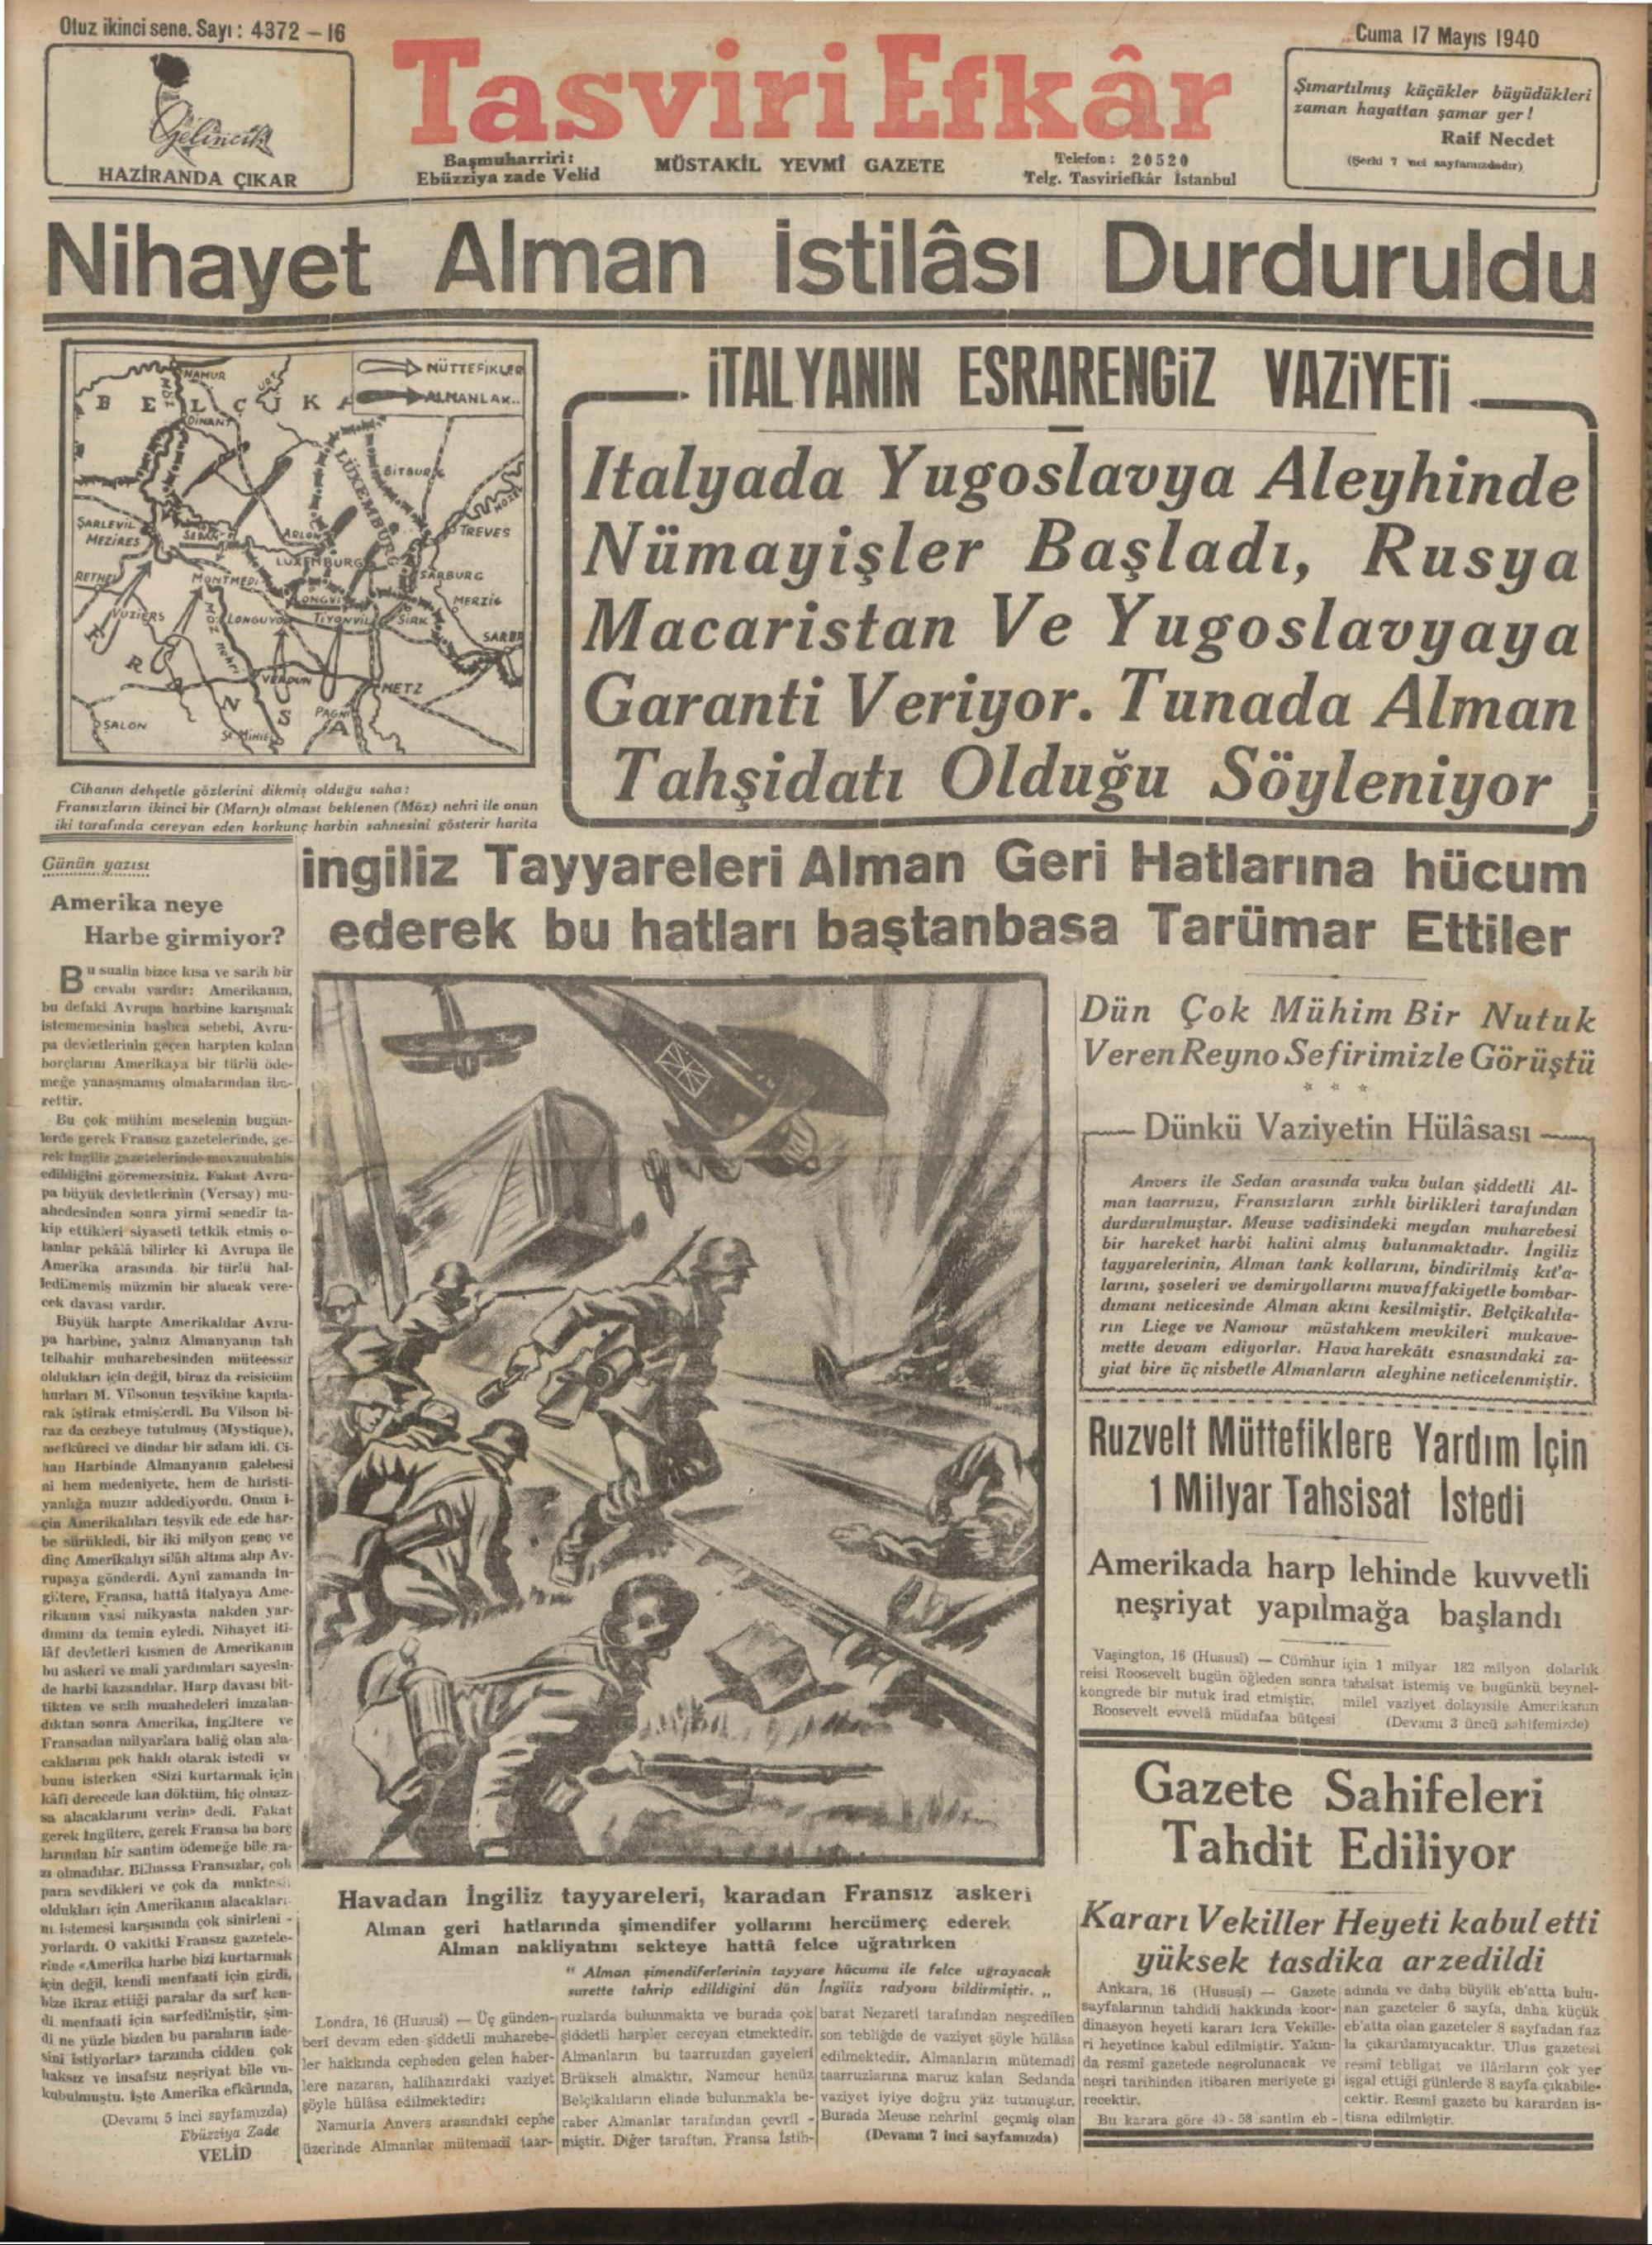 17 Mayıs 1940 Tarihli Tasviri Efkar Gazetesi Sayfa 1